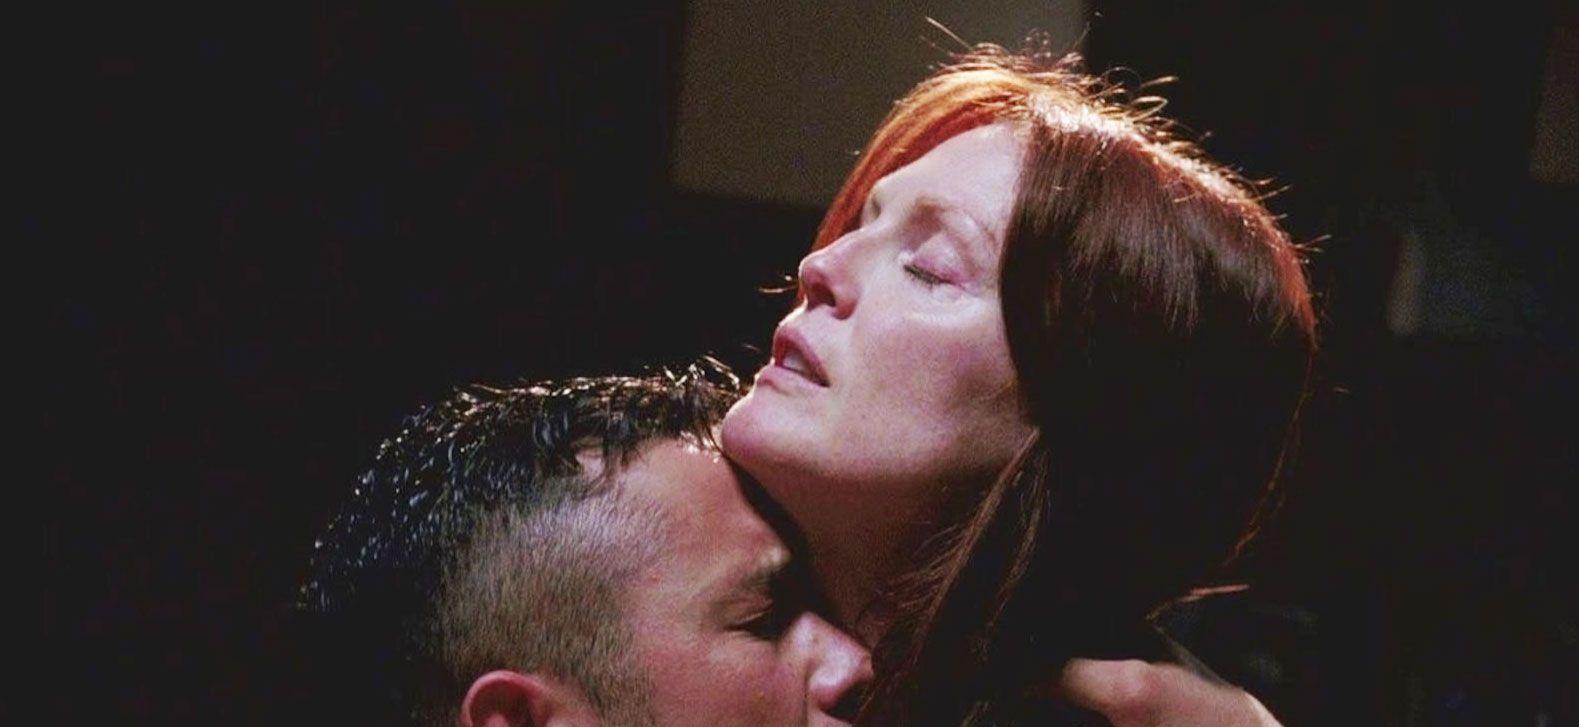 11 Super Realistic Movie Sex Scenes You Can Stream Right Now